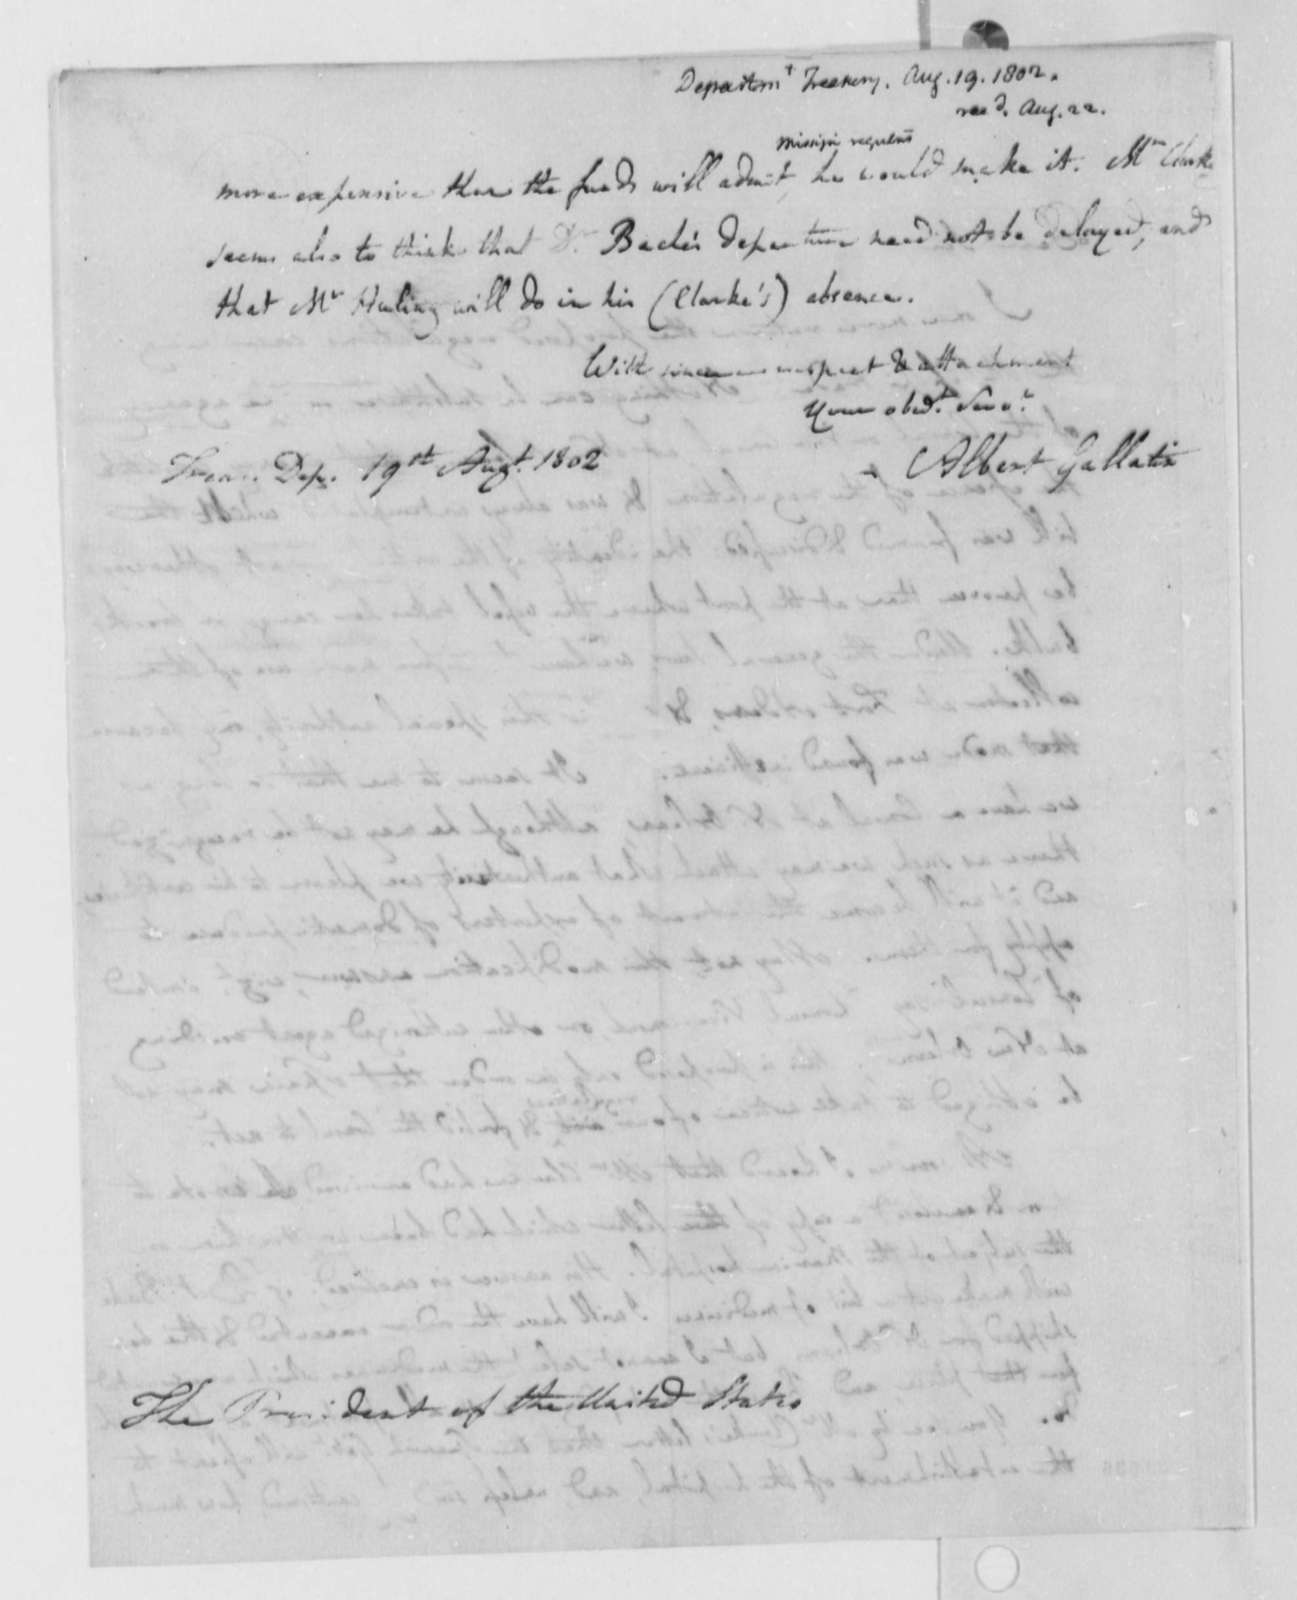 Albert Gallatin to Thomas Jefferson, August 19, 1802